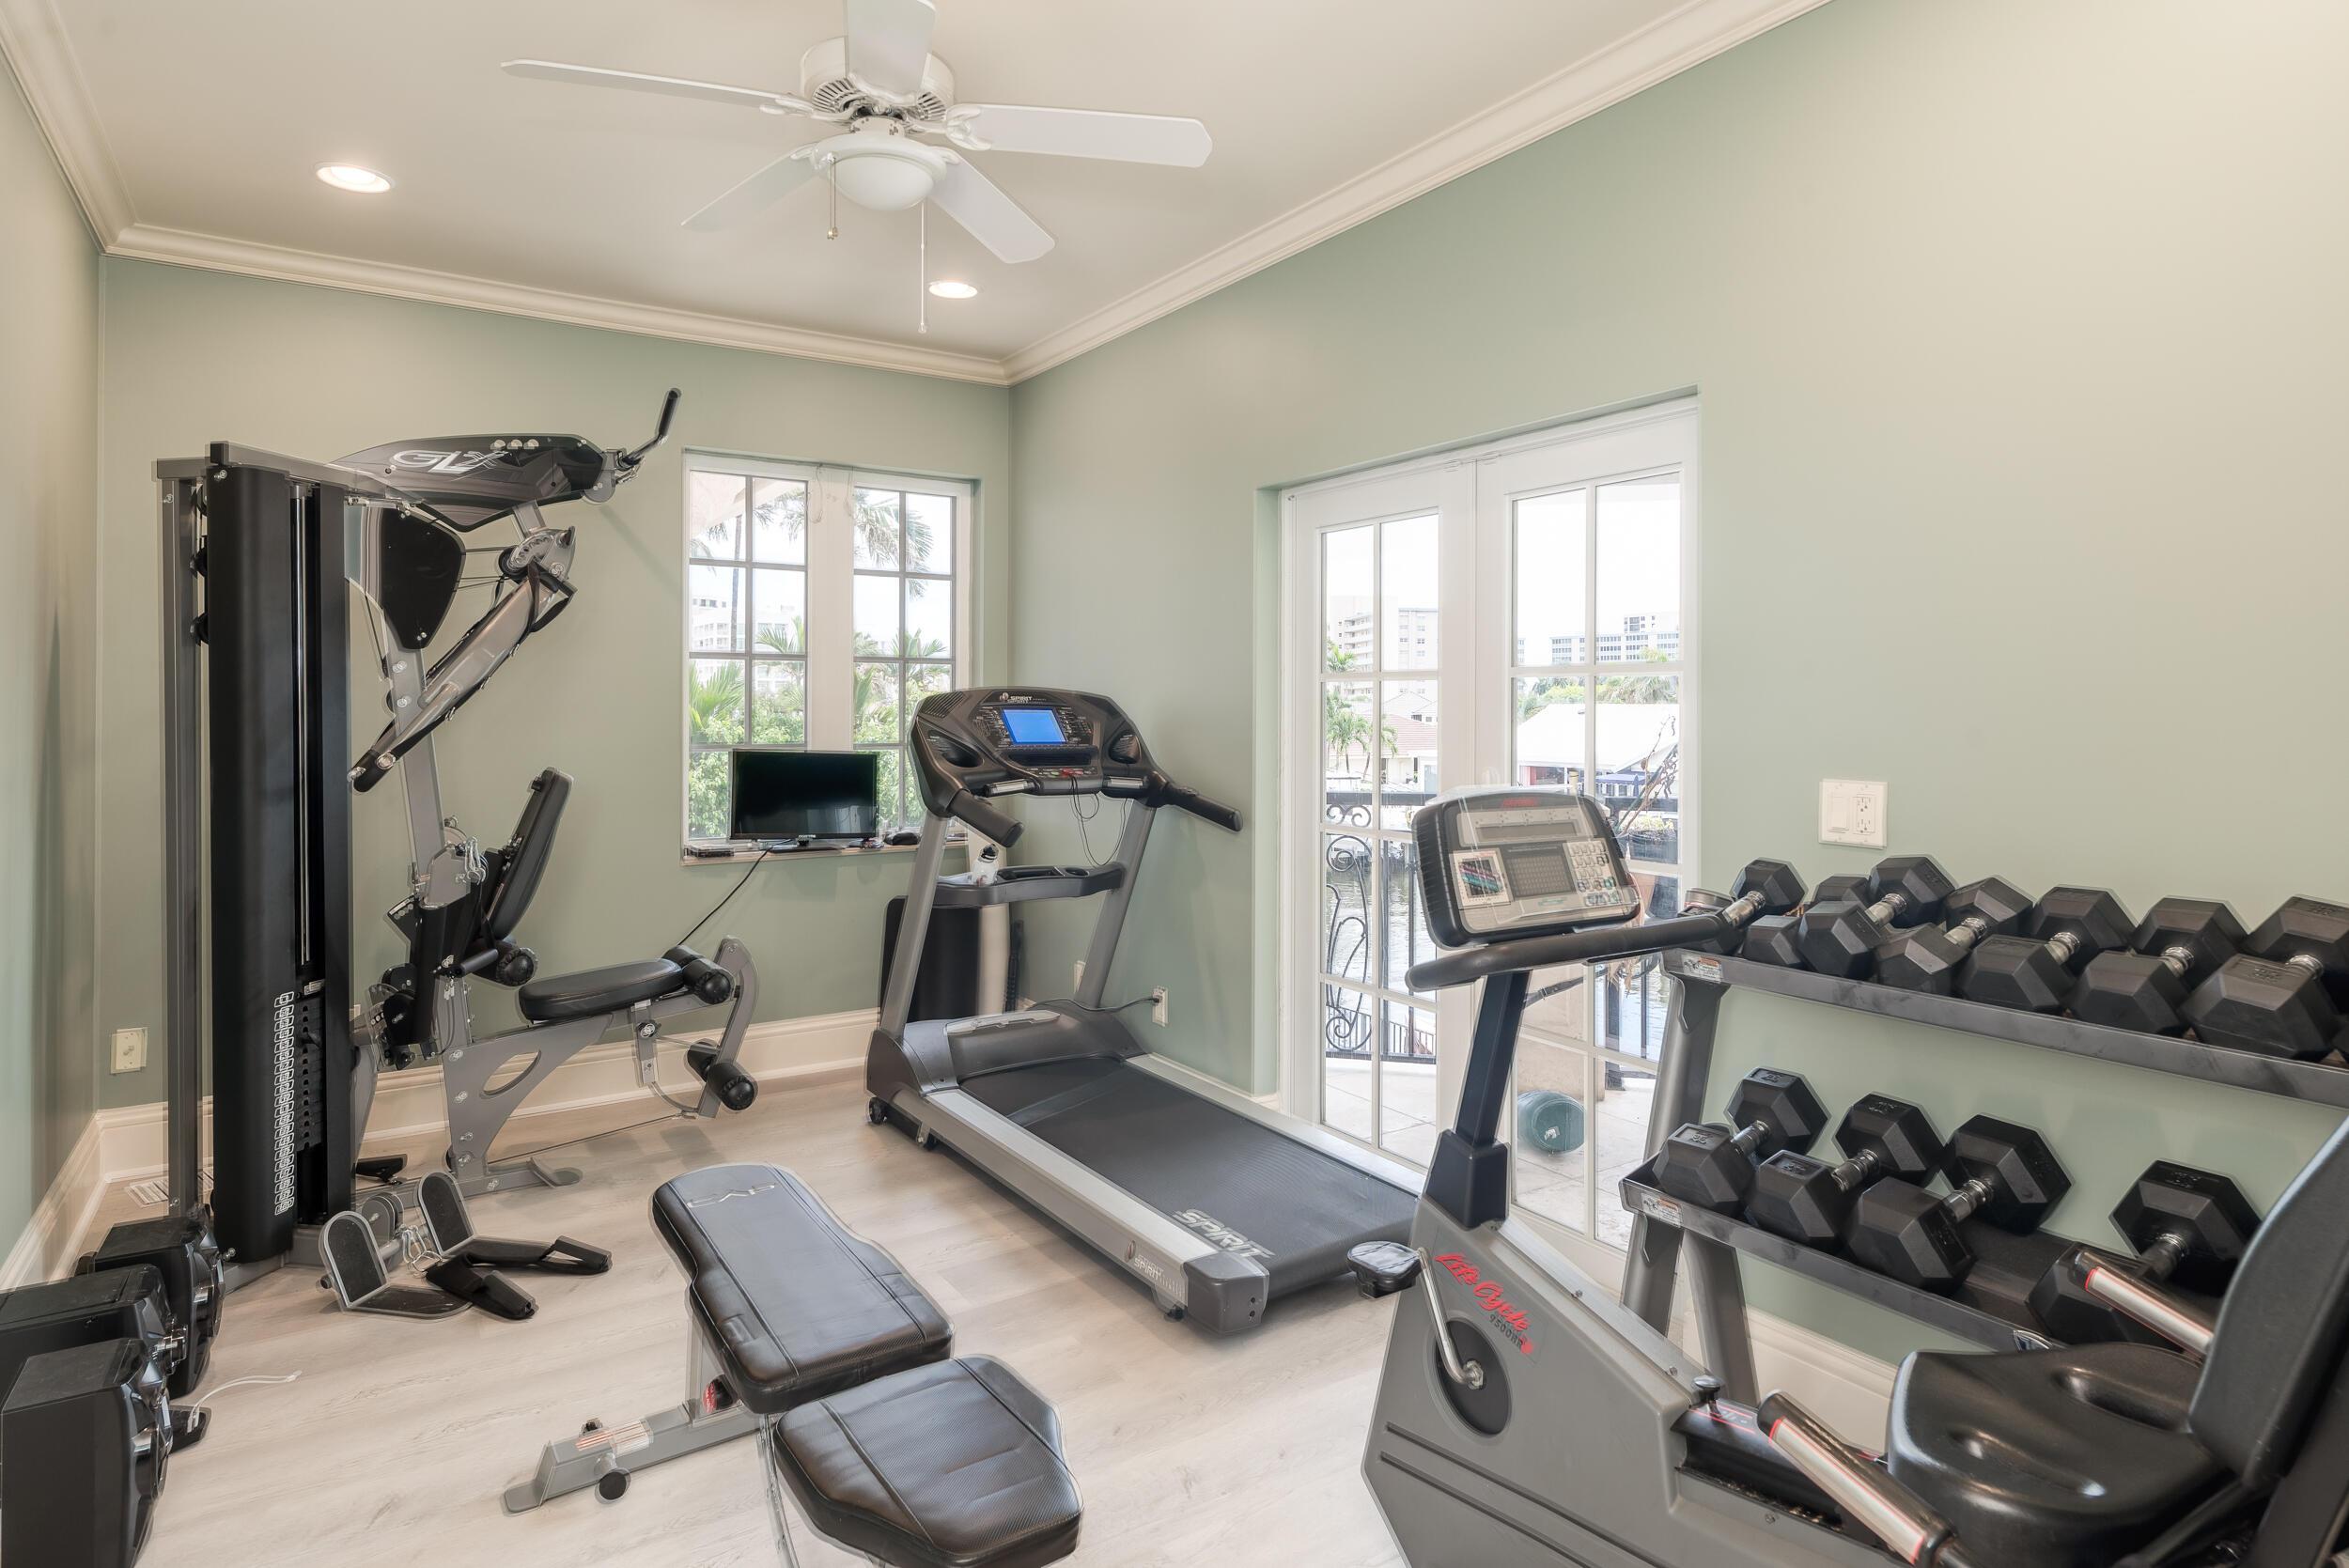 036_Gym